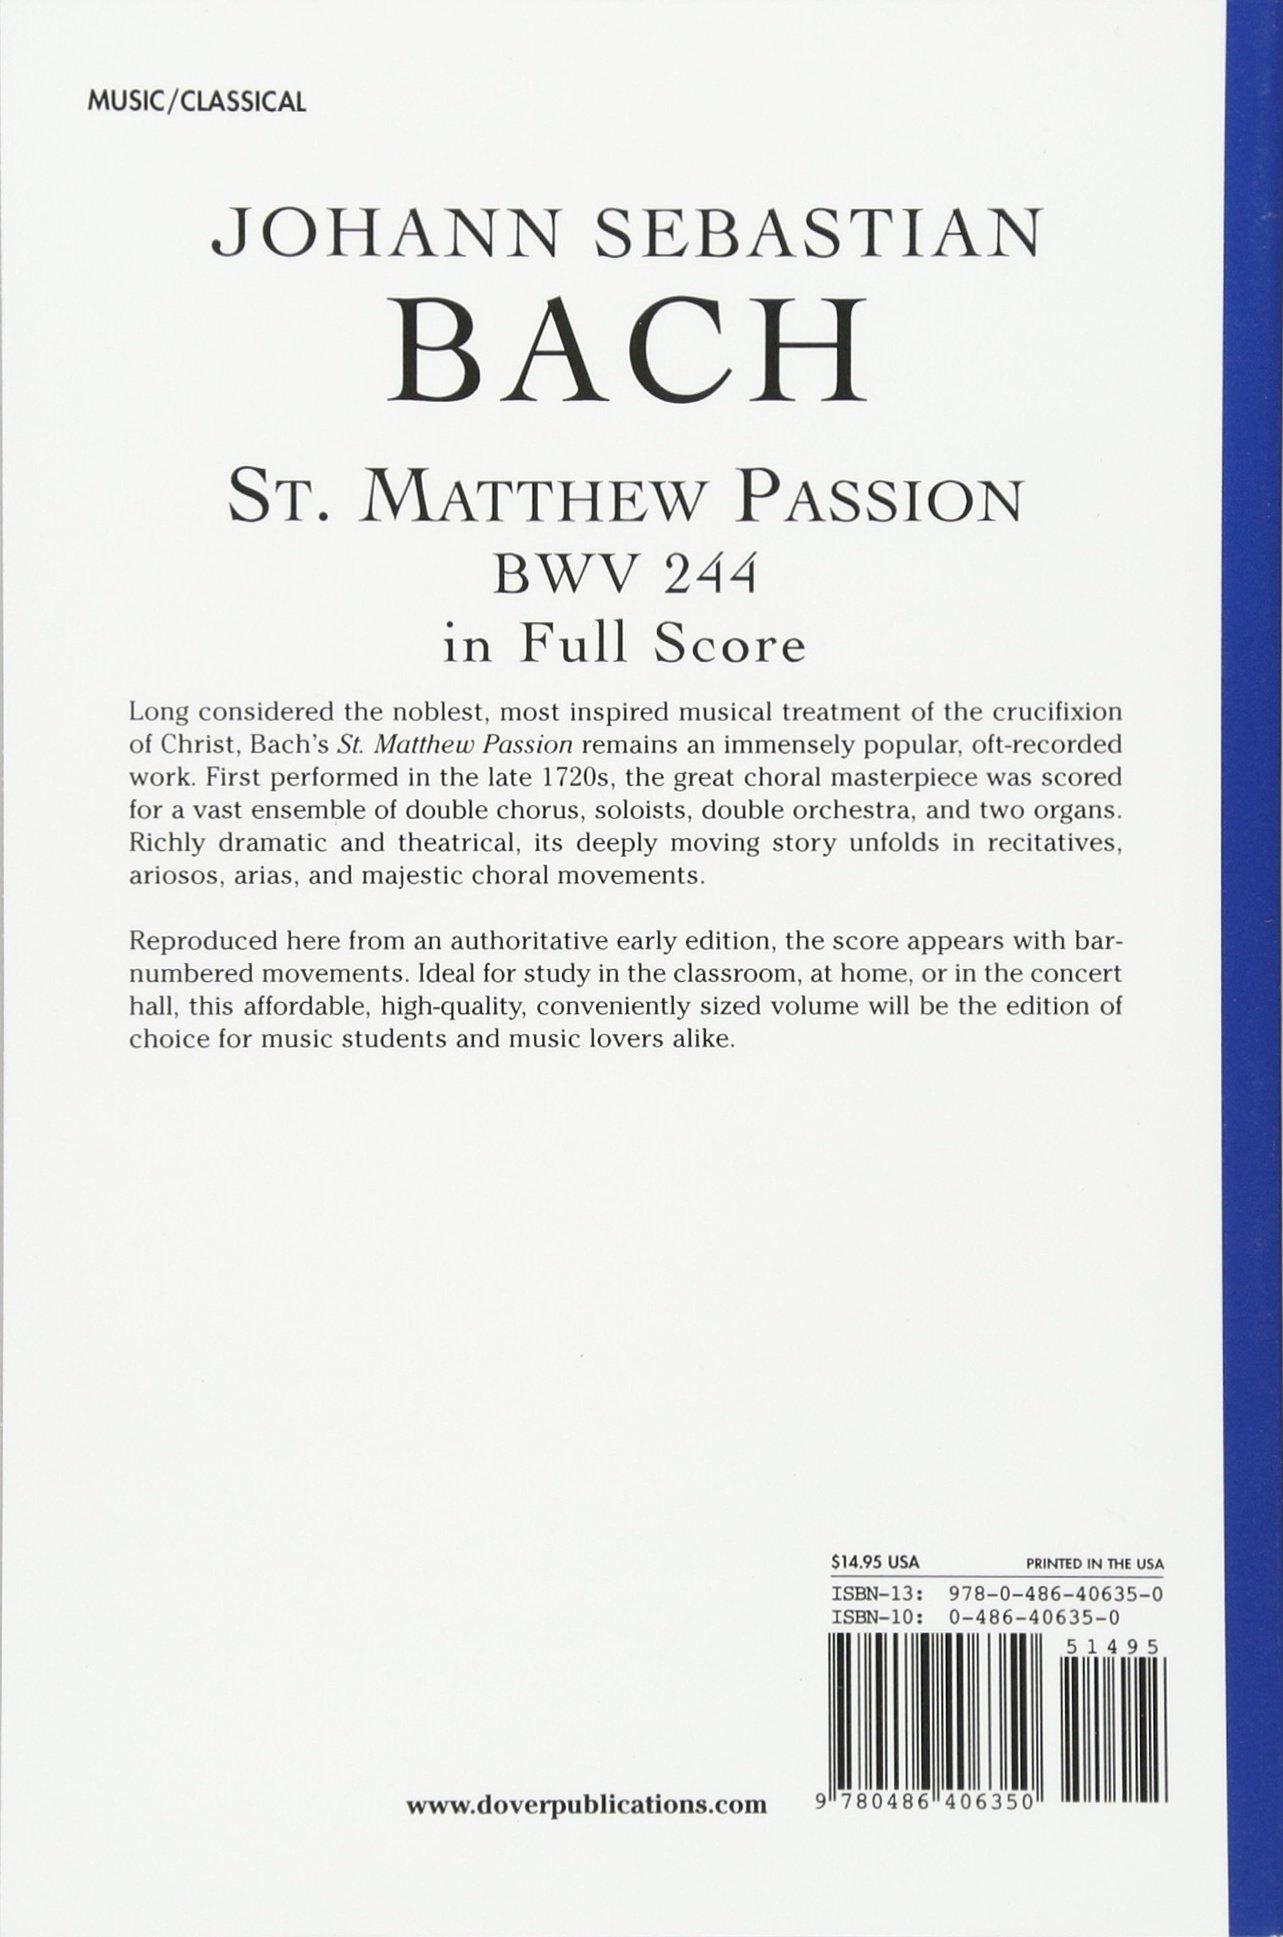 St. Matthew Passion, BWV 244, in Full Score (Dover Miniature Scores): Johann Sebastian Bach, Music Scores: 0800759406357: Amazon.com: Books